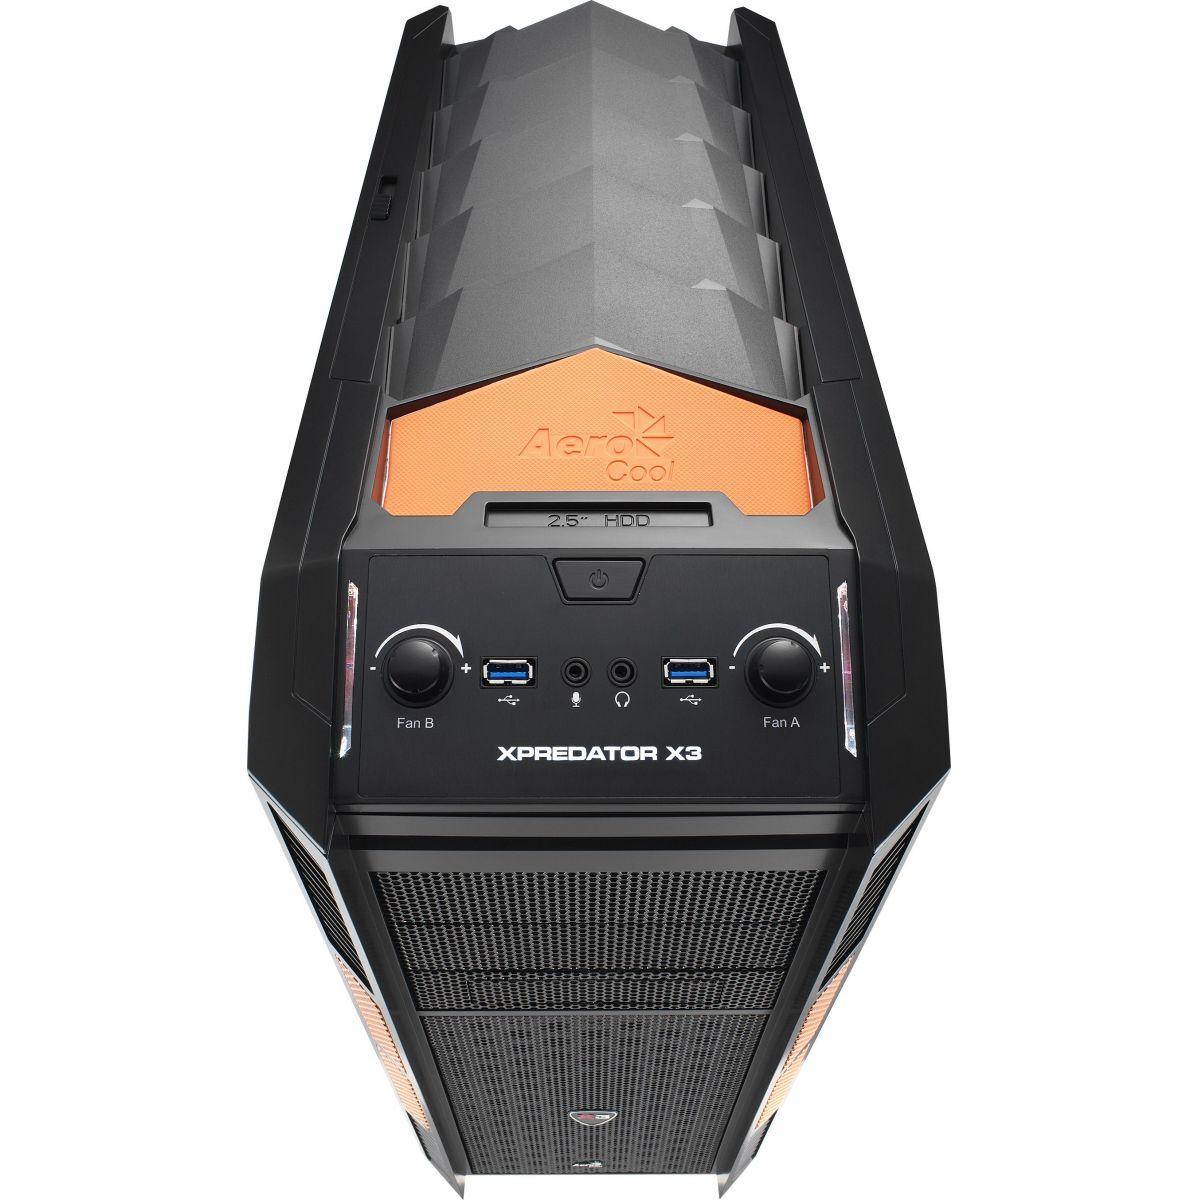 Gabinete ATX Xpredator X3 Evil Black EN57103 - Aerocool